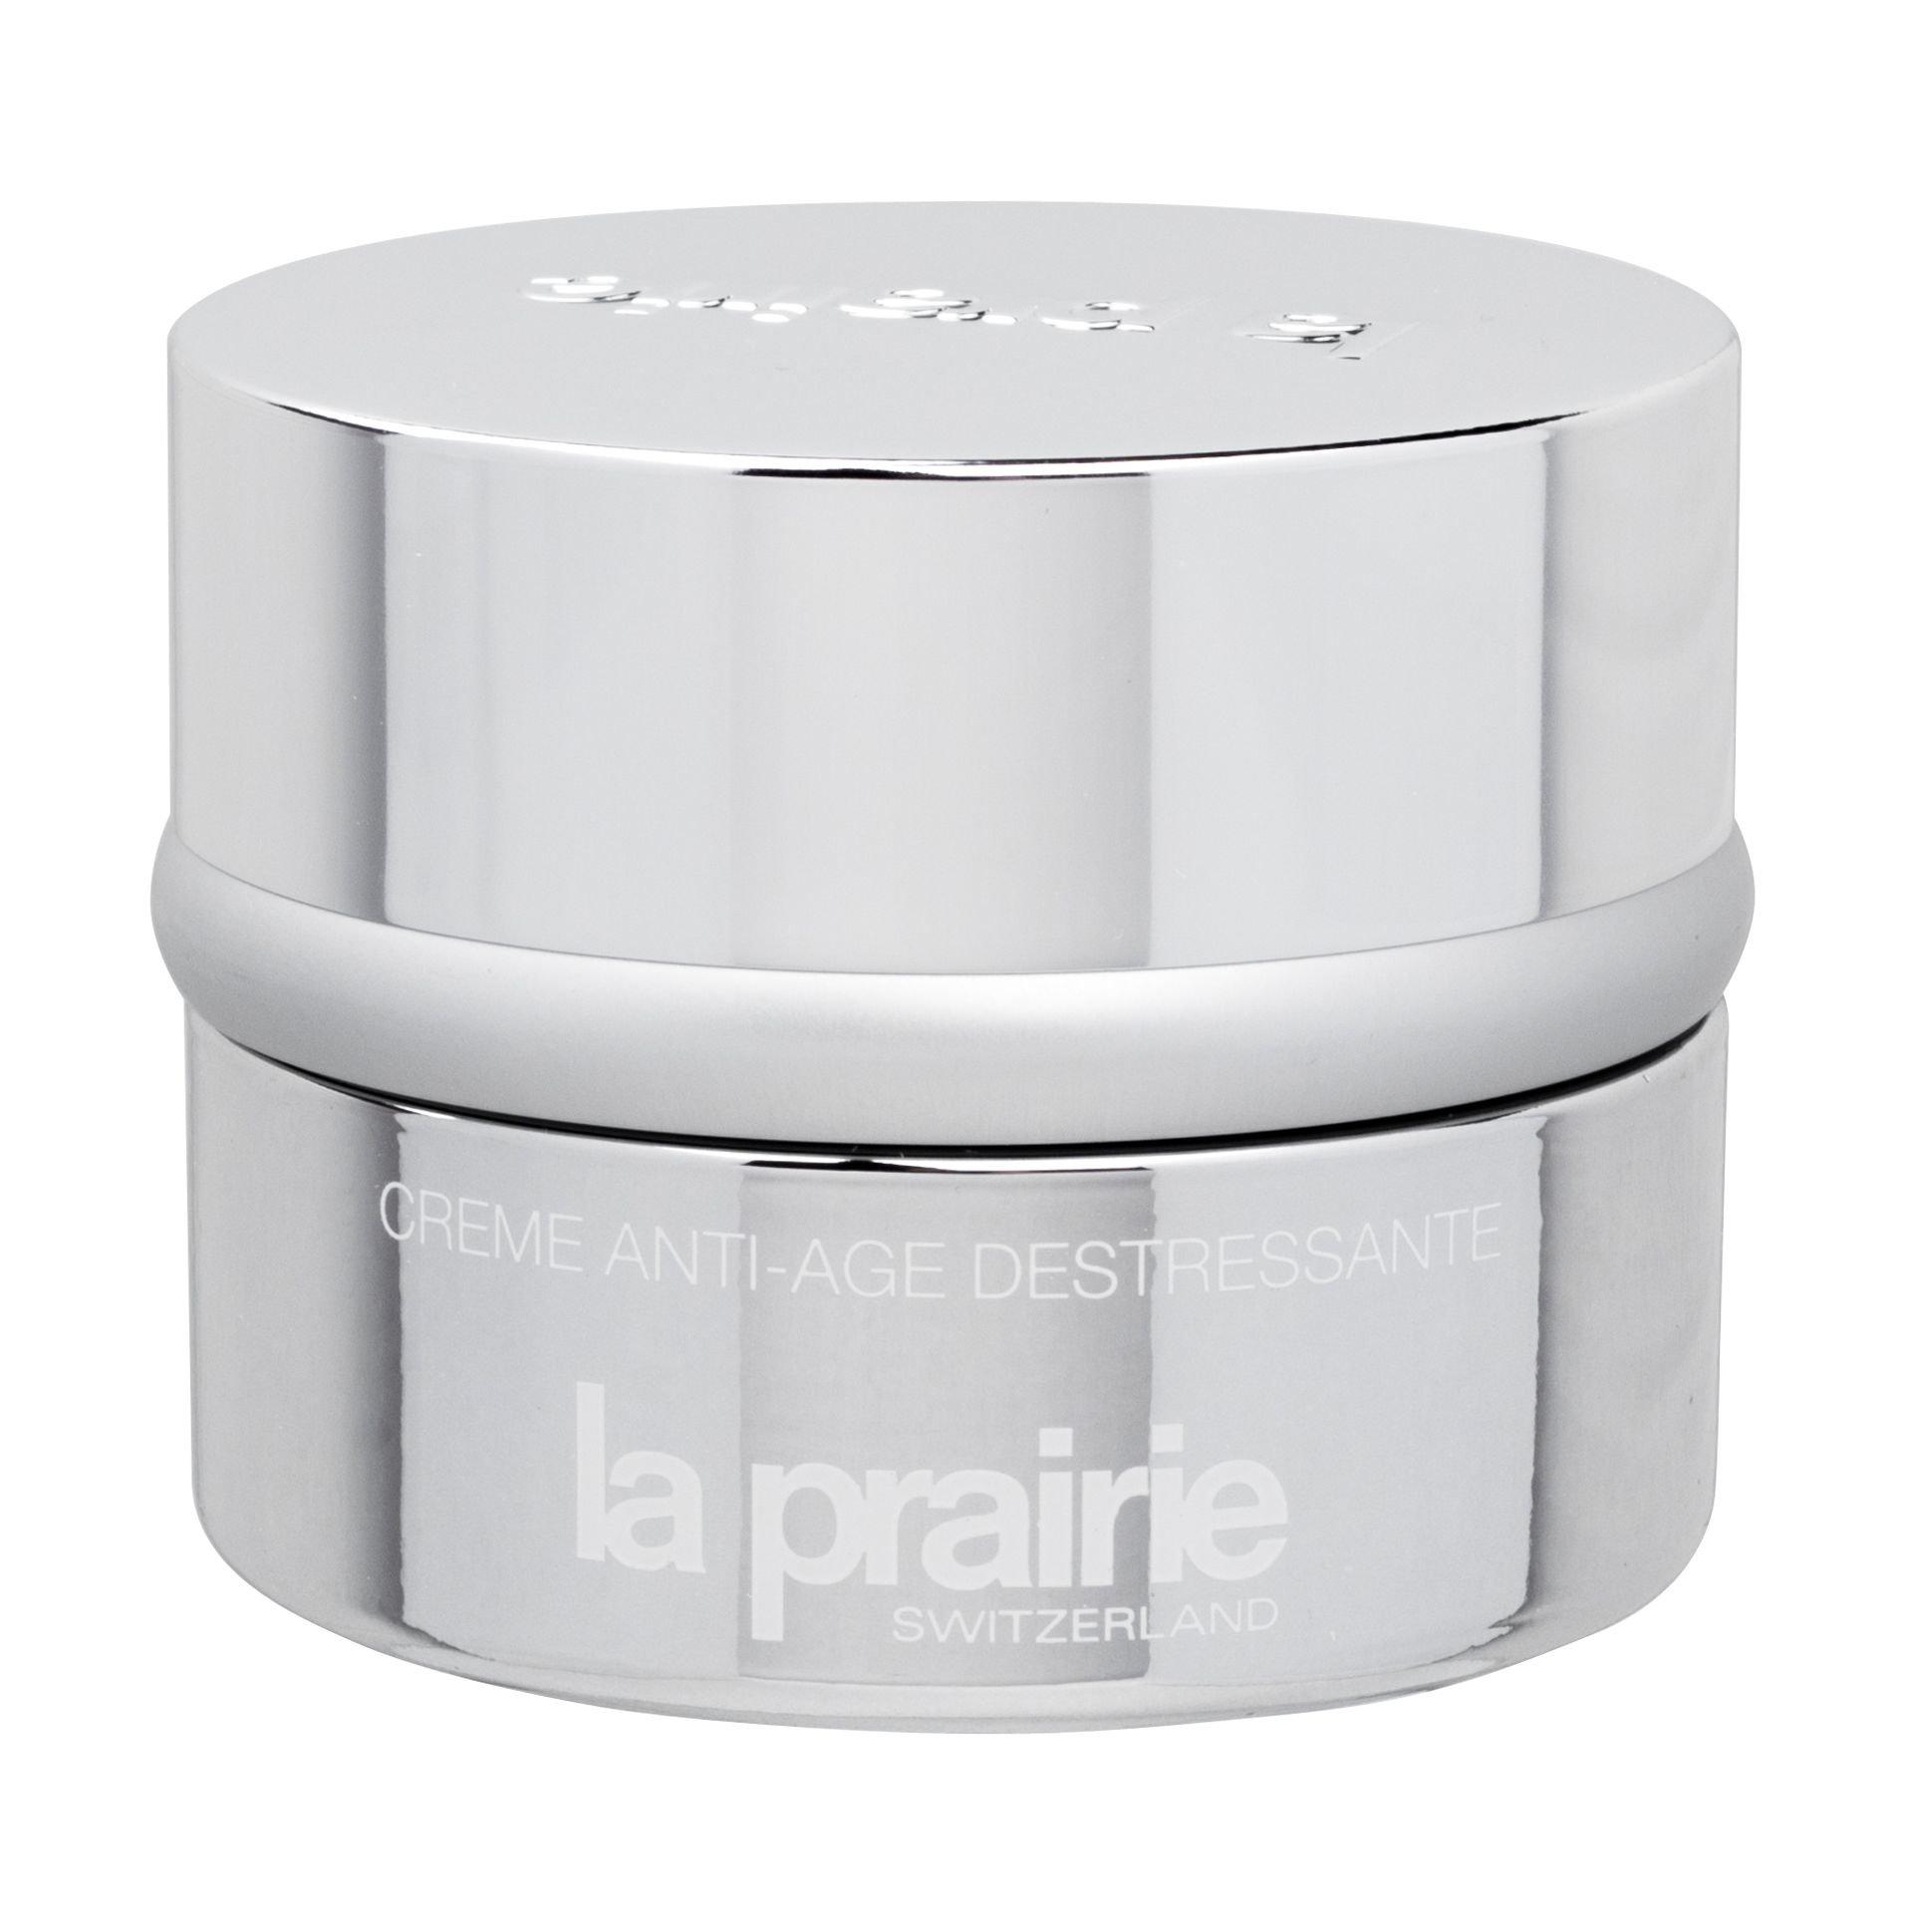 La Prairie Anti Aging Day Cream 50ml